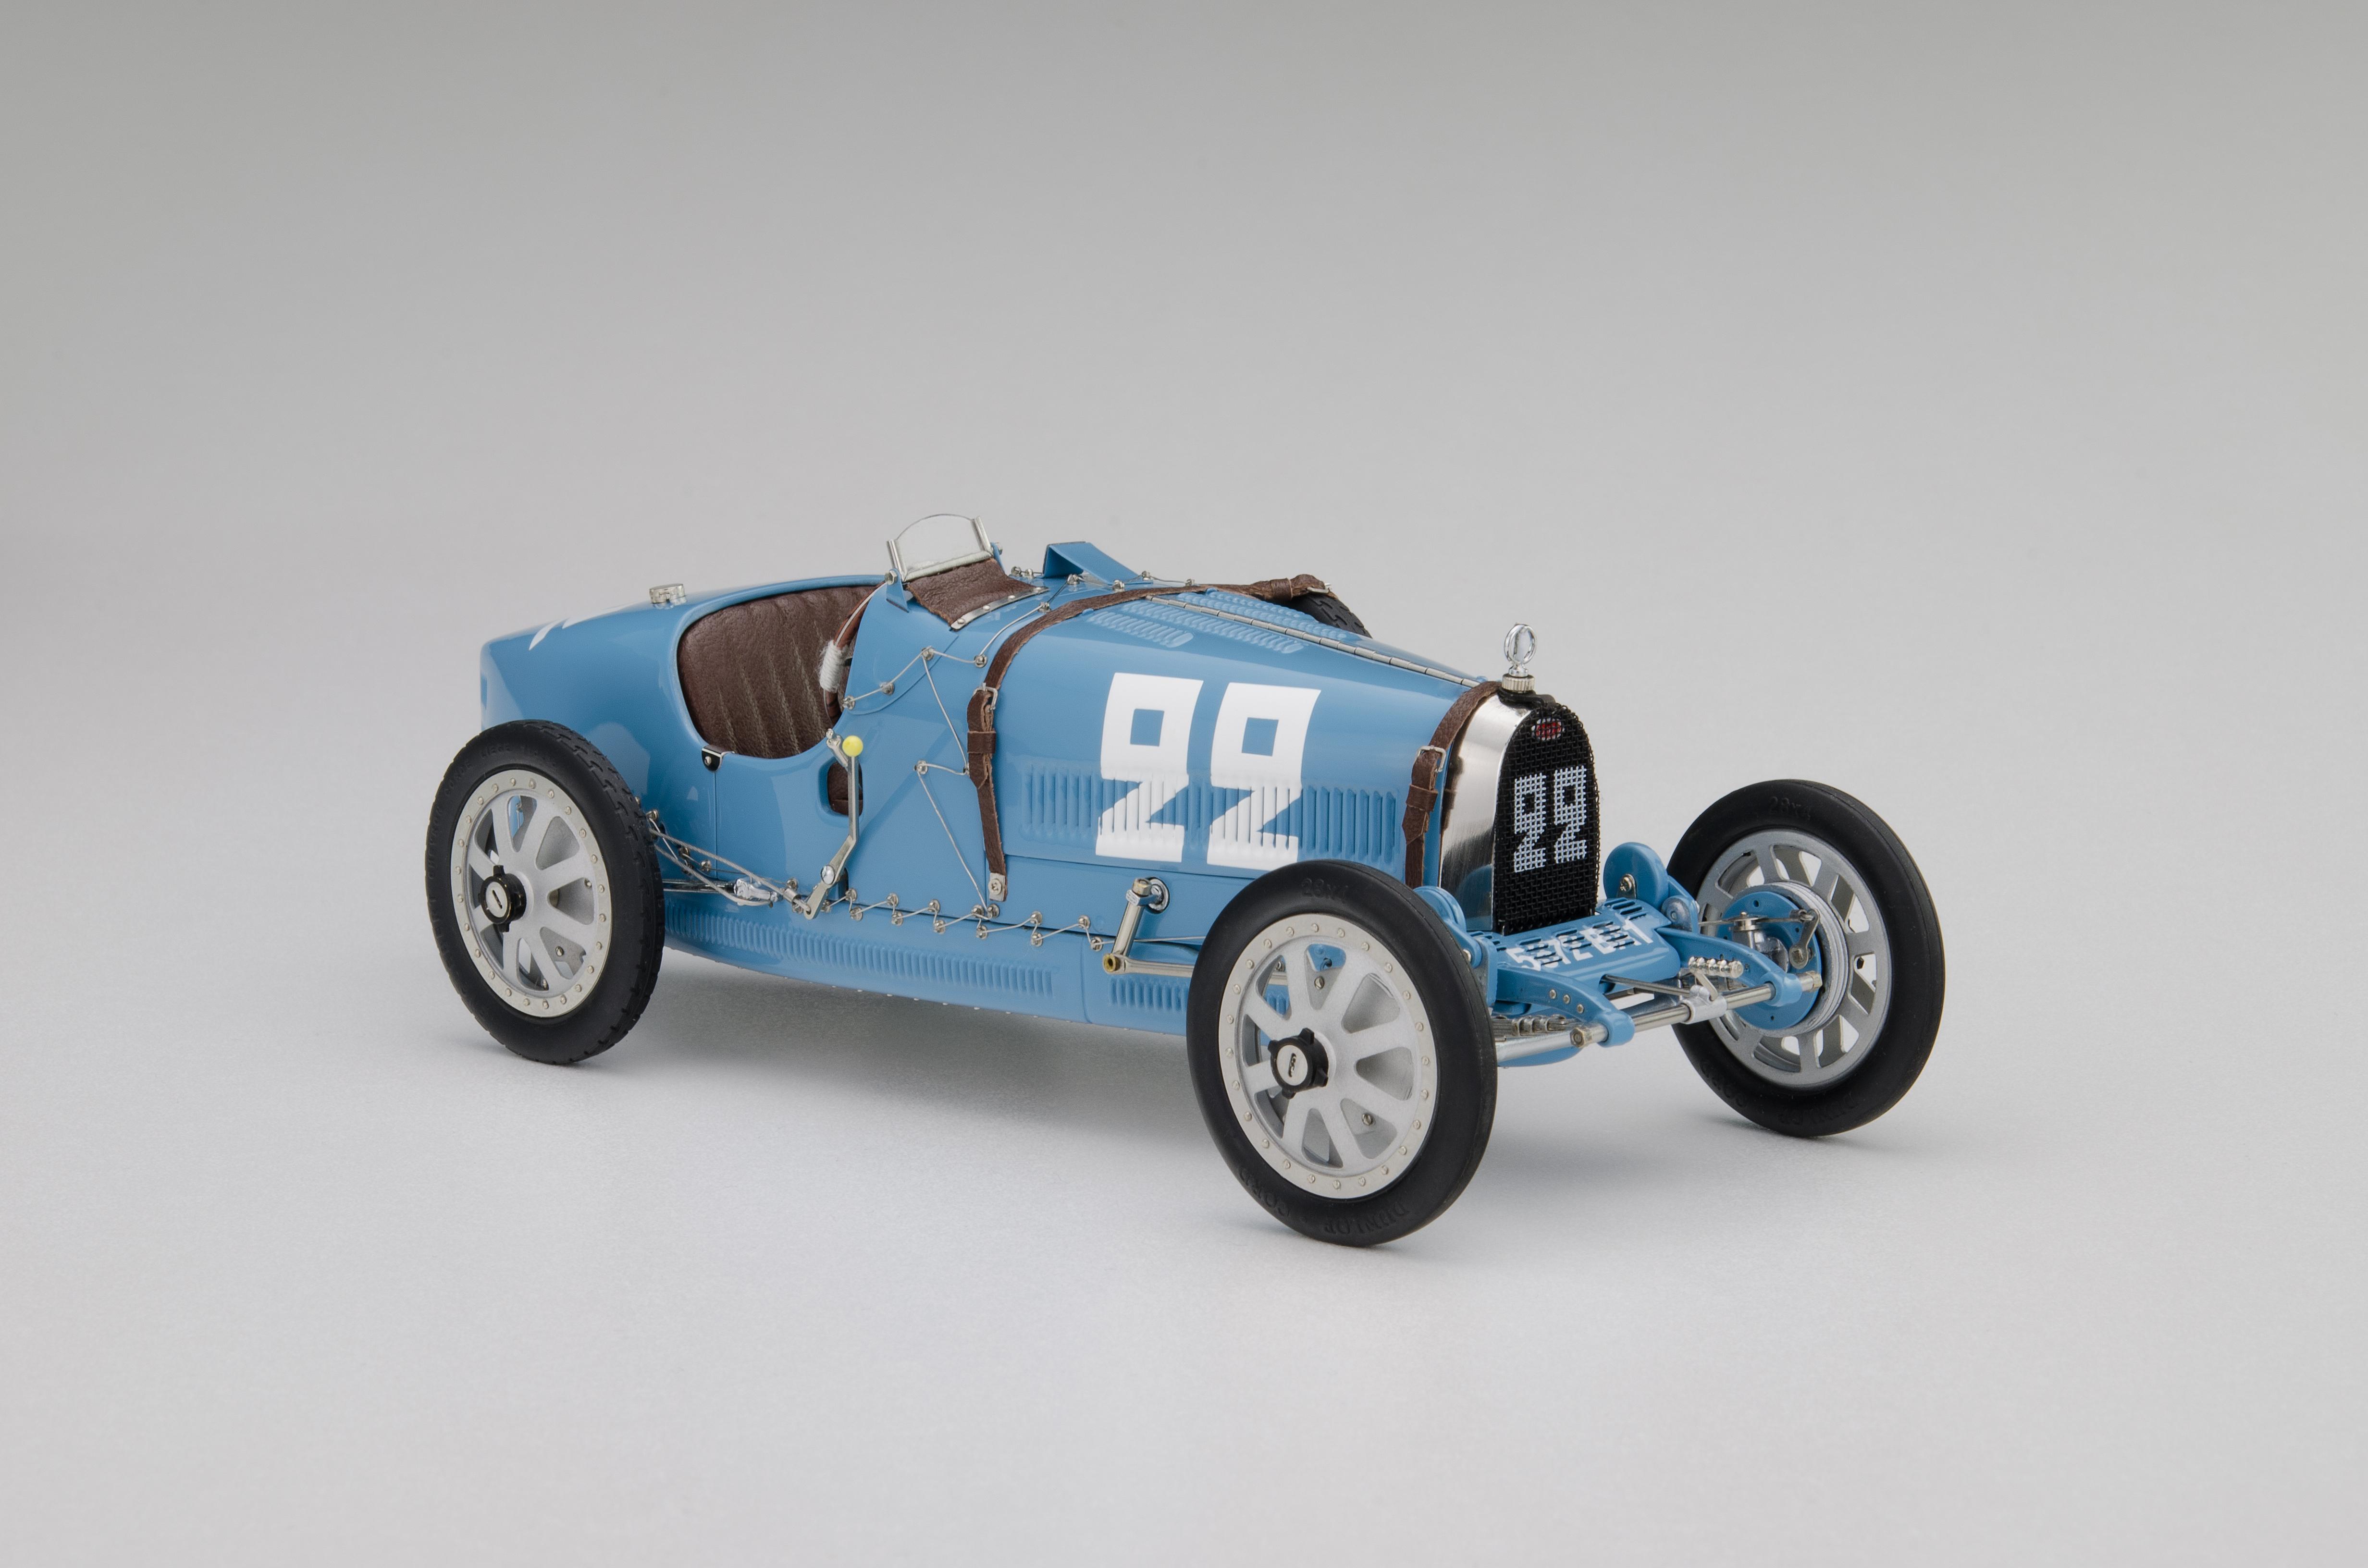 CMC 1/18 ブガッティ T35 #22 ネーションカラープロジェクト フランス 1924 BUGATTI - T35 N 22 NATION COULOR PROJECT FRANCE 1924 LIGHT BLUE